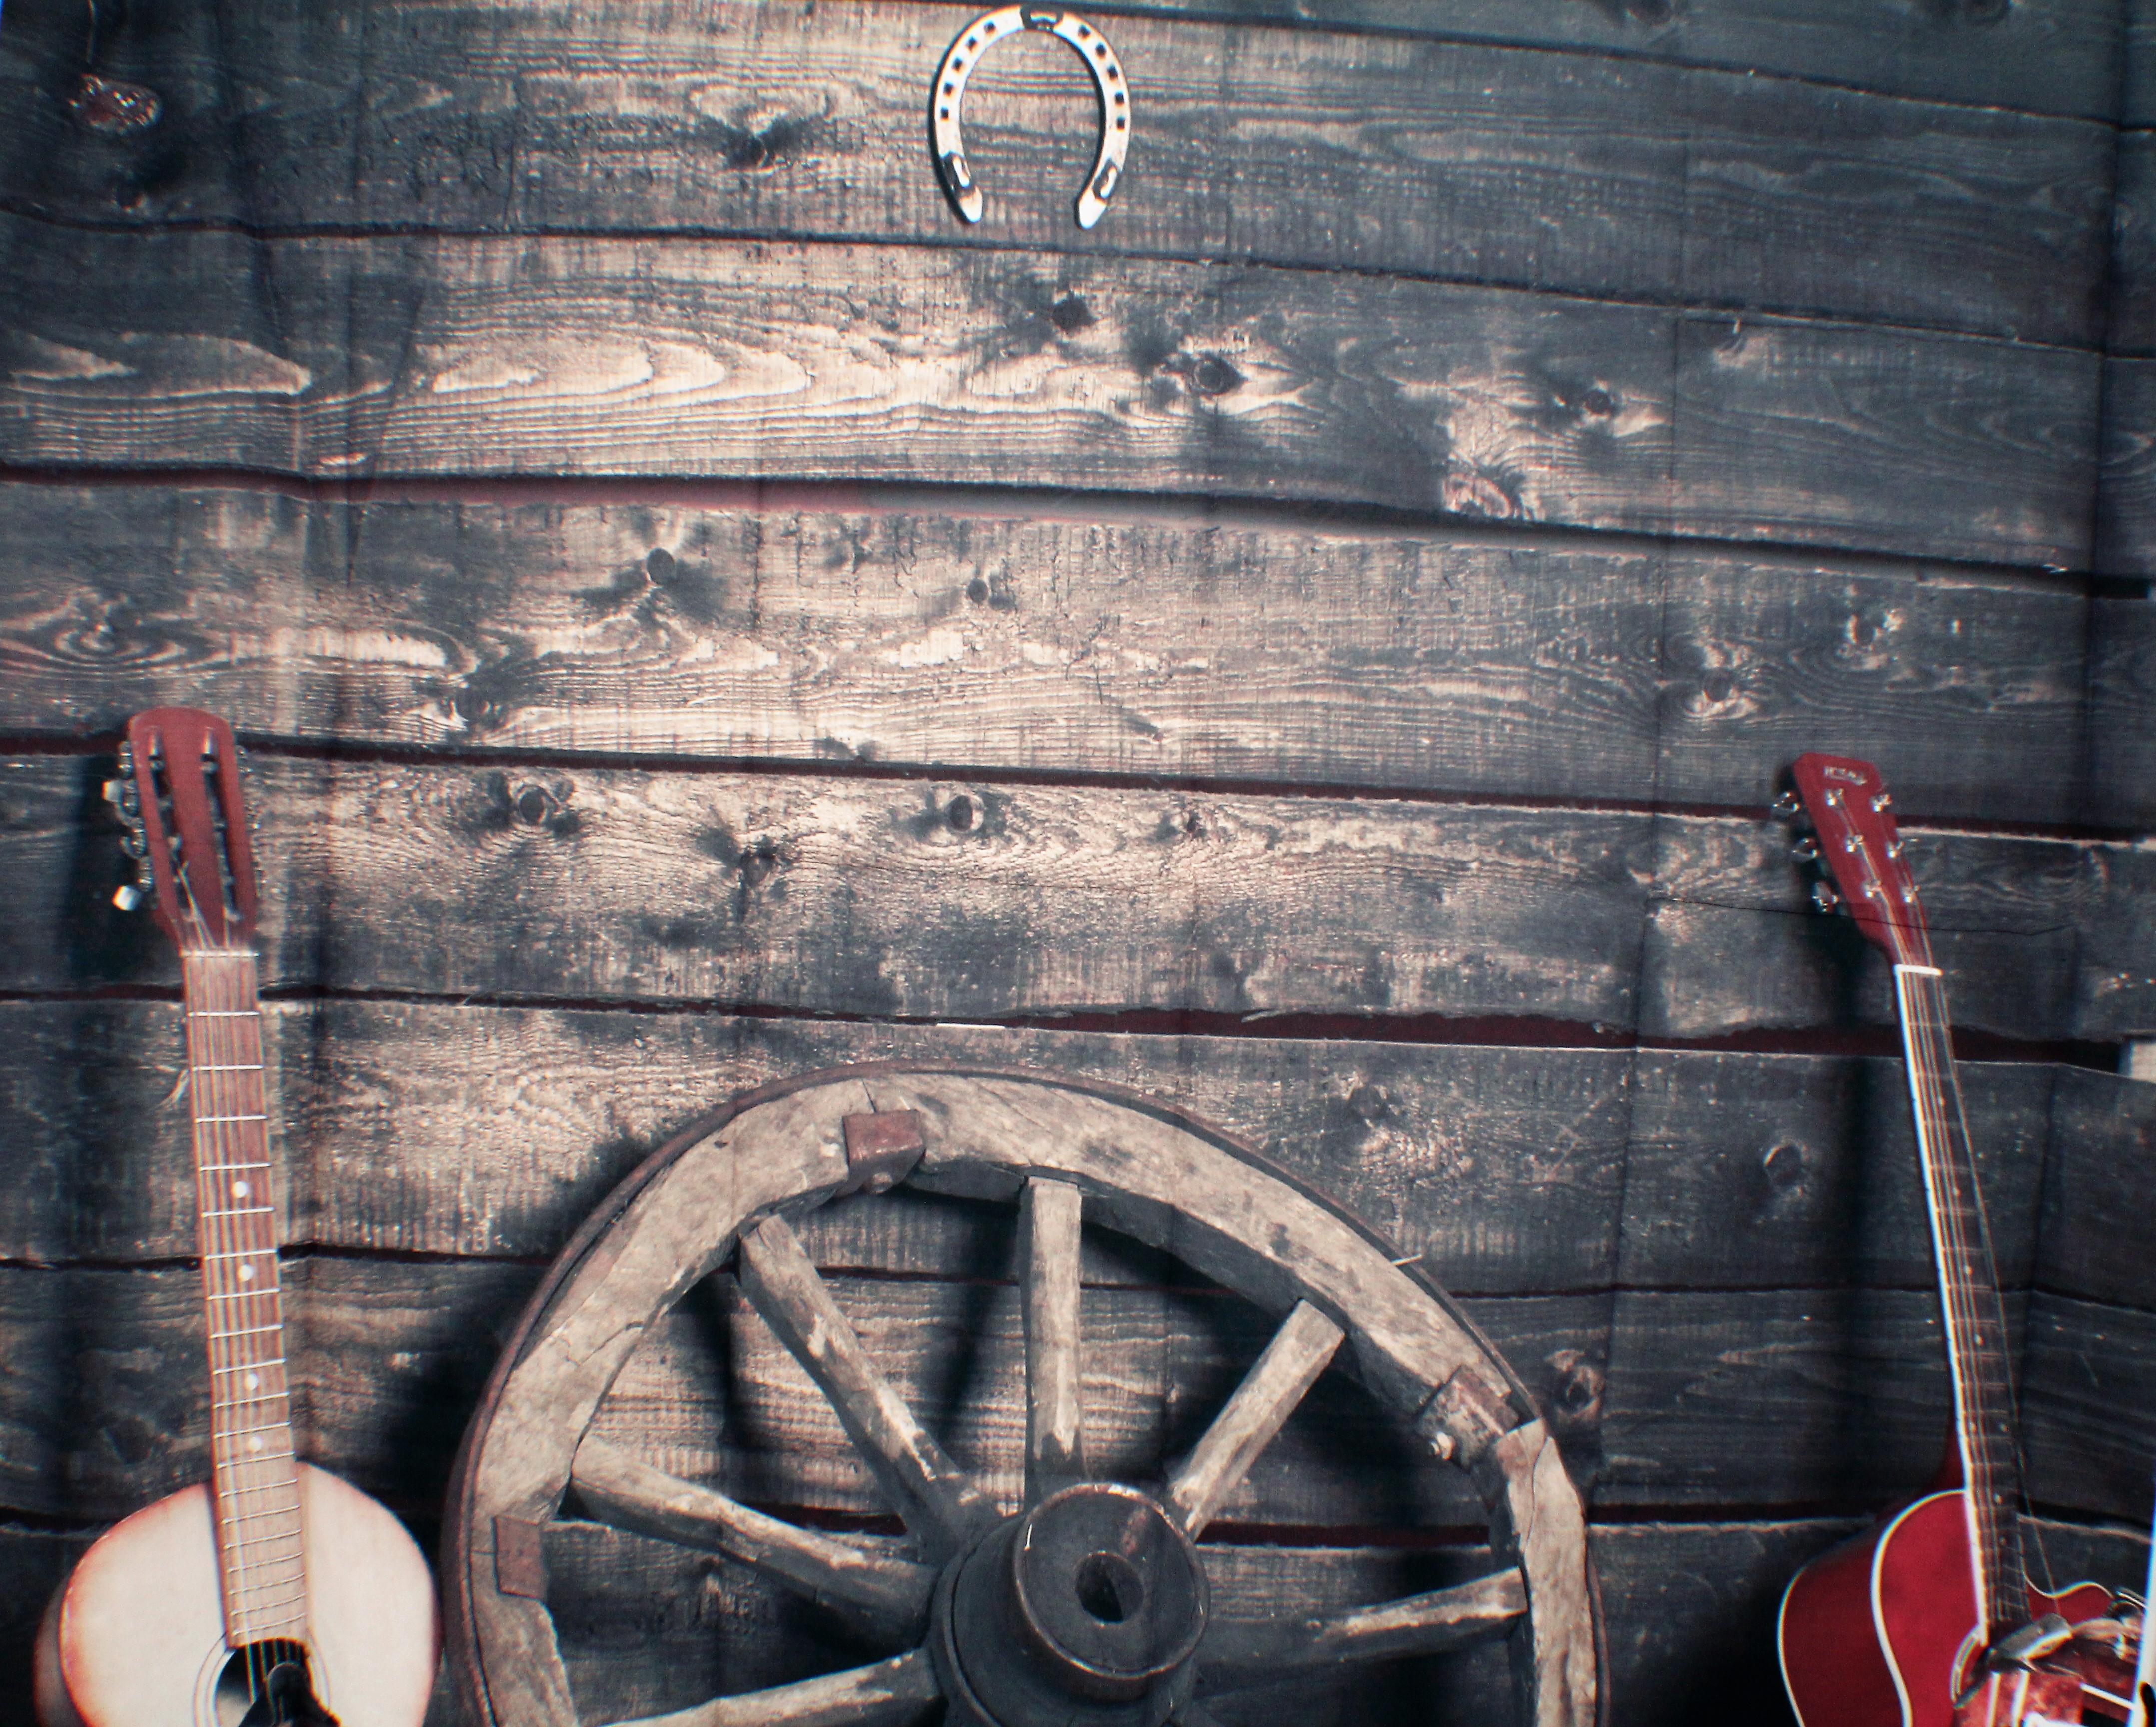 34 Guitars and Wagon Wheel